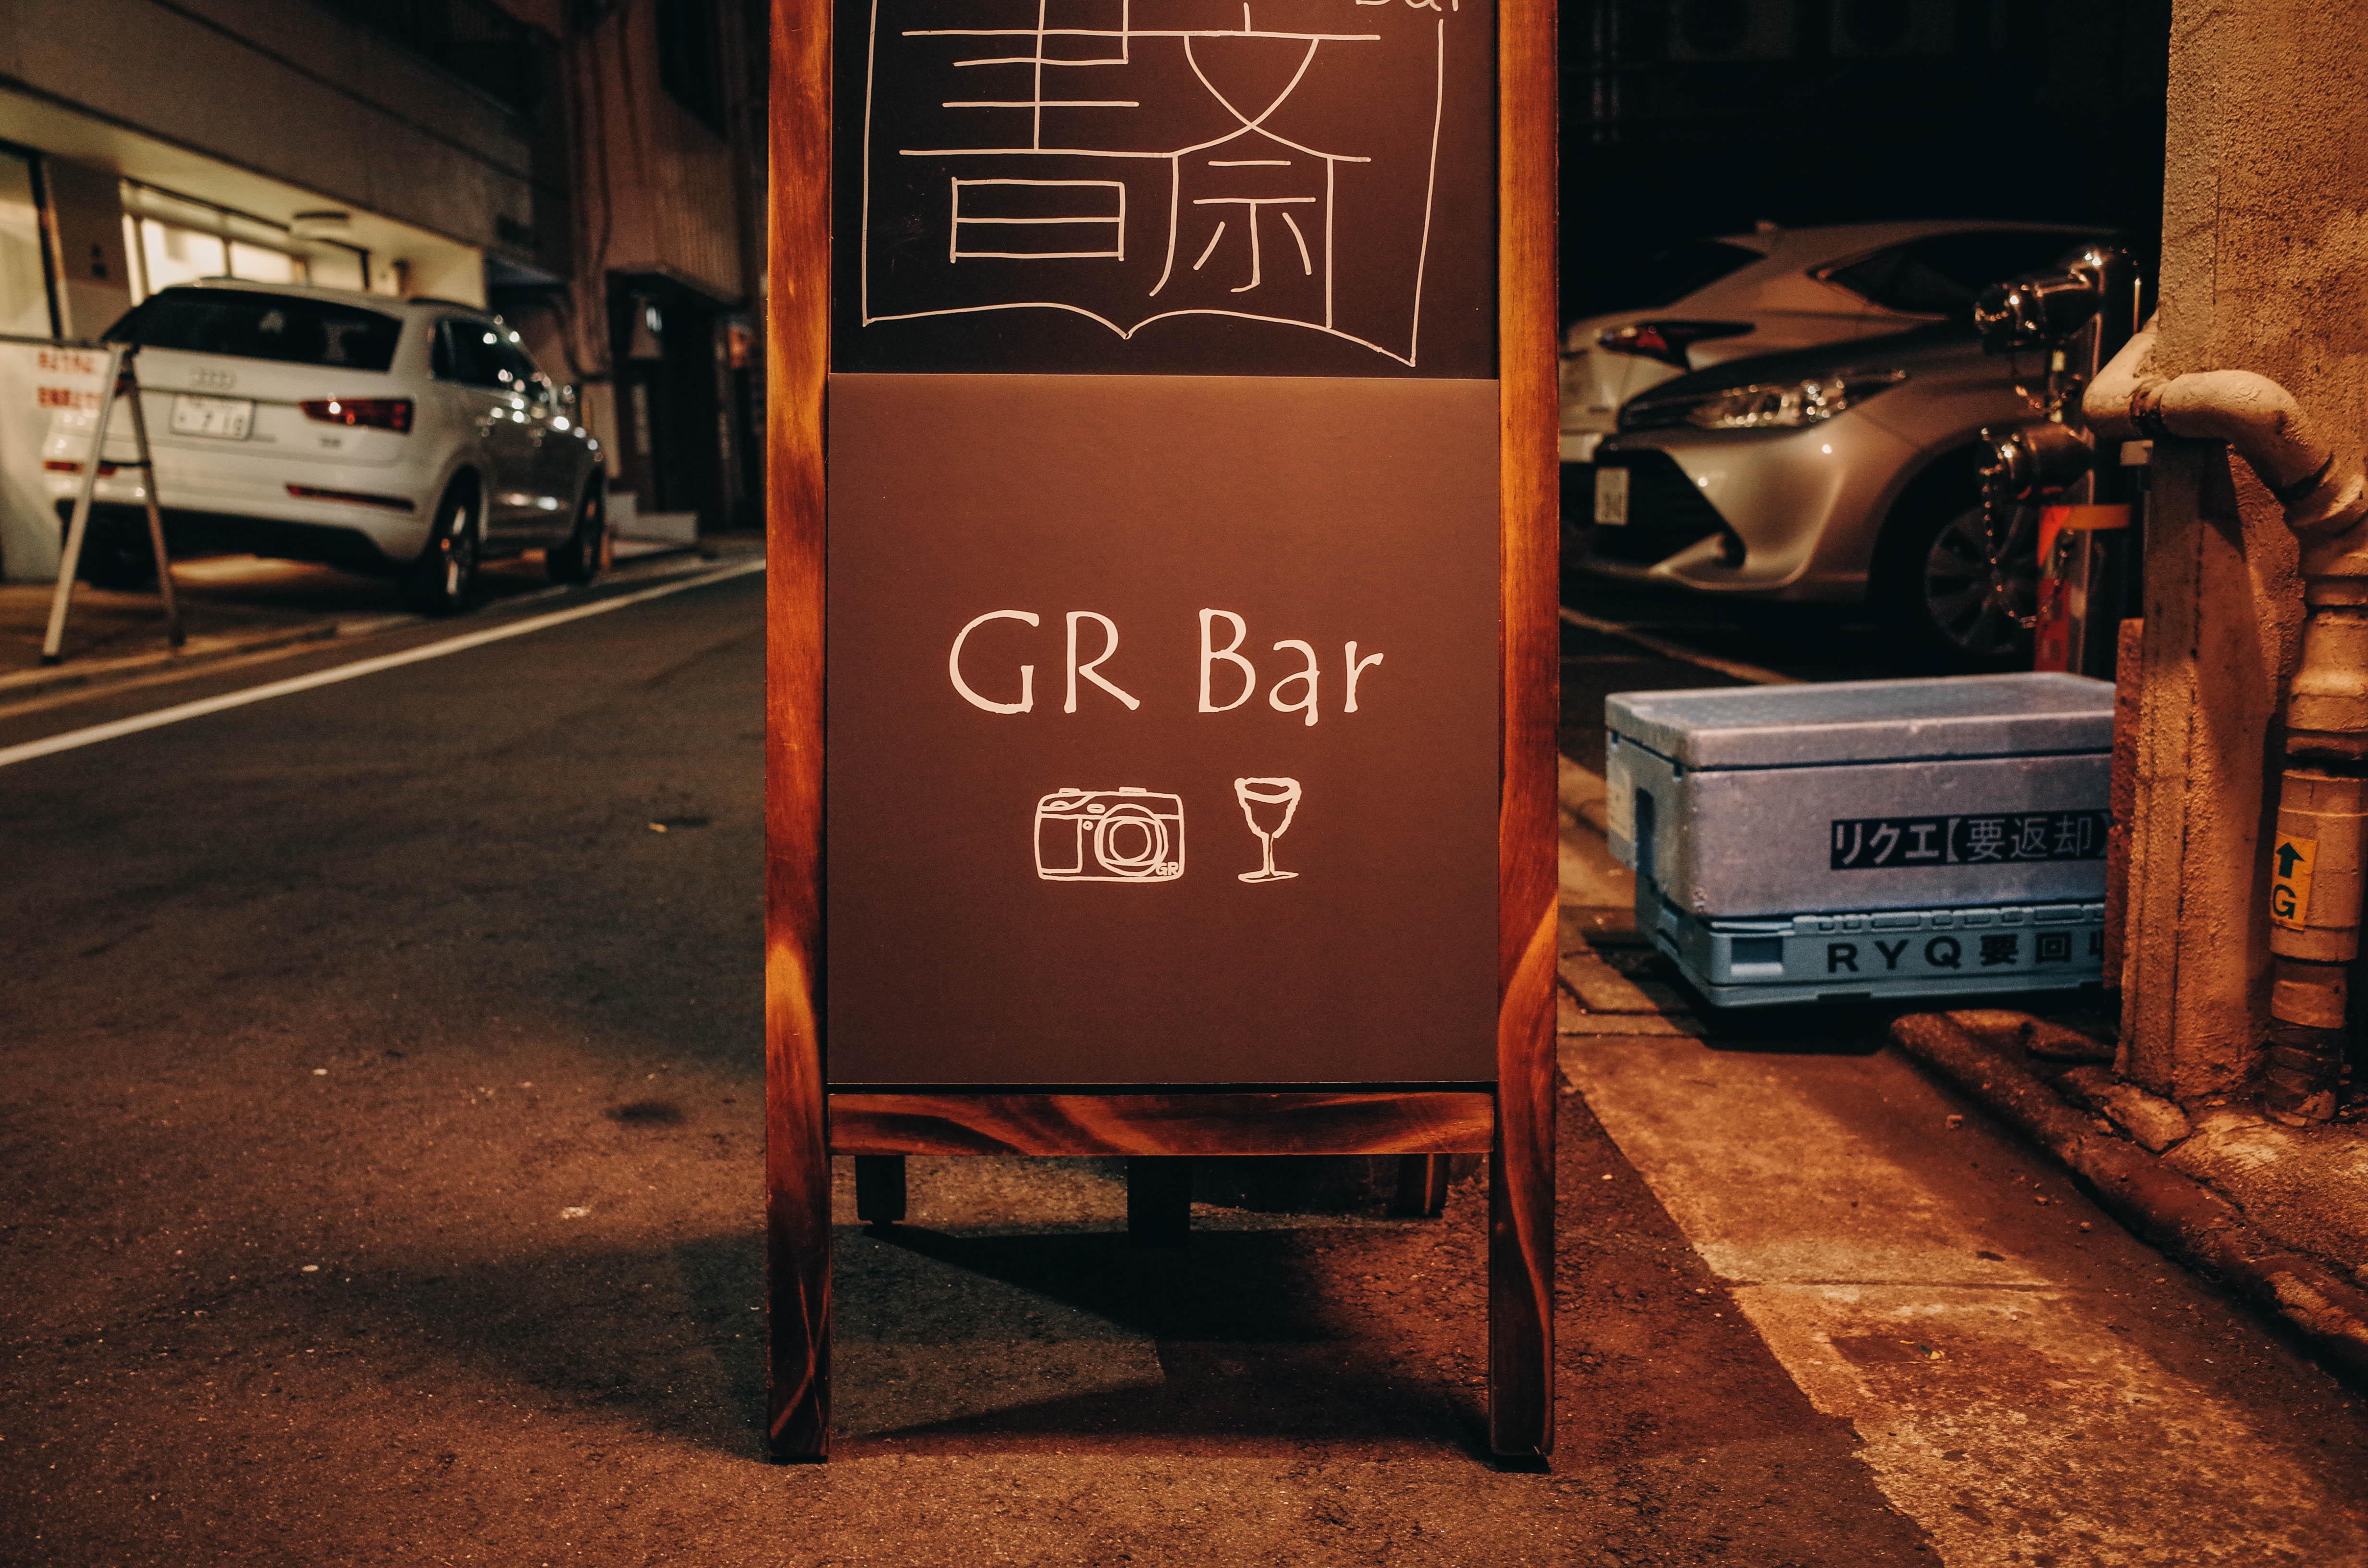 GR Barの看板